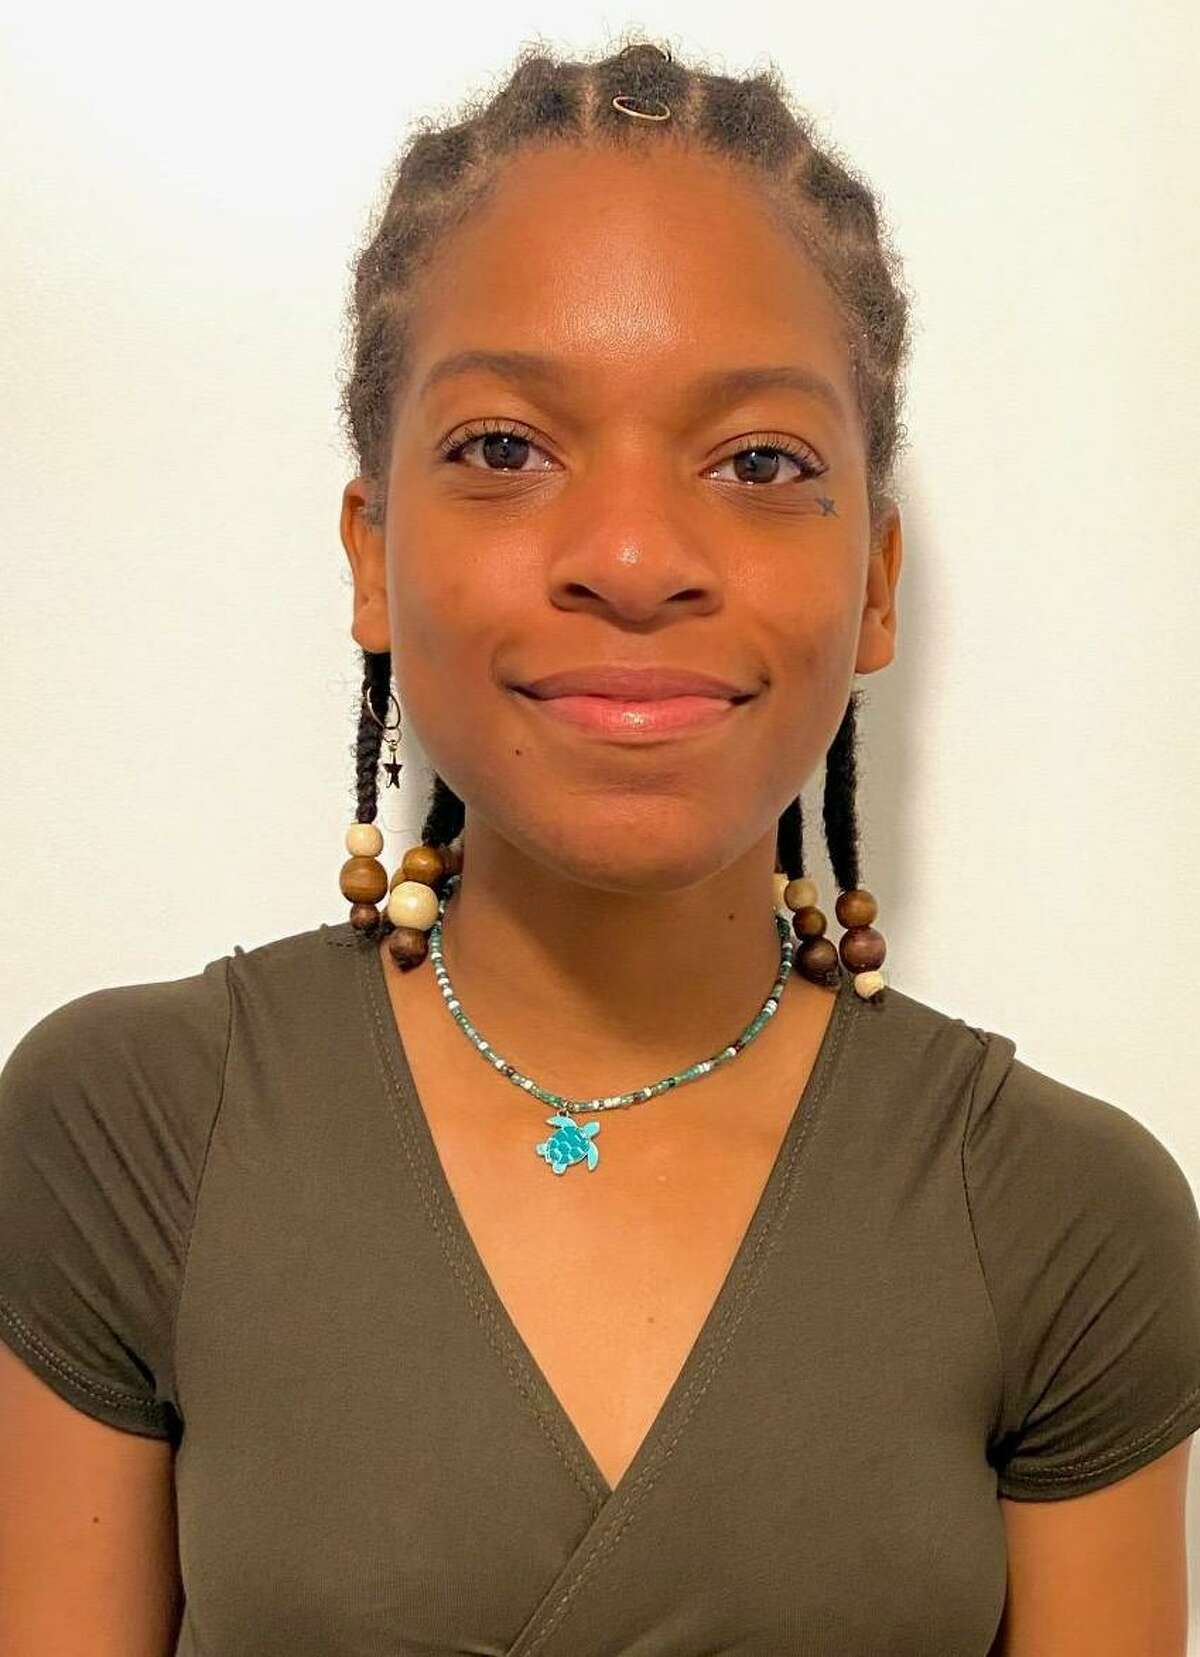 Norwalk High graduate Christline Edward is the recipient of the 2021 Chelsea Cohen Scholarship.